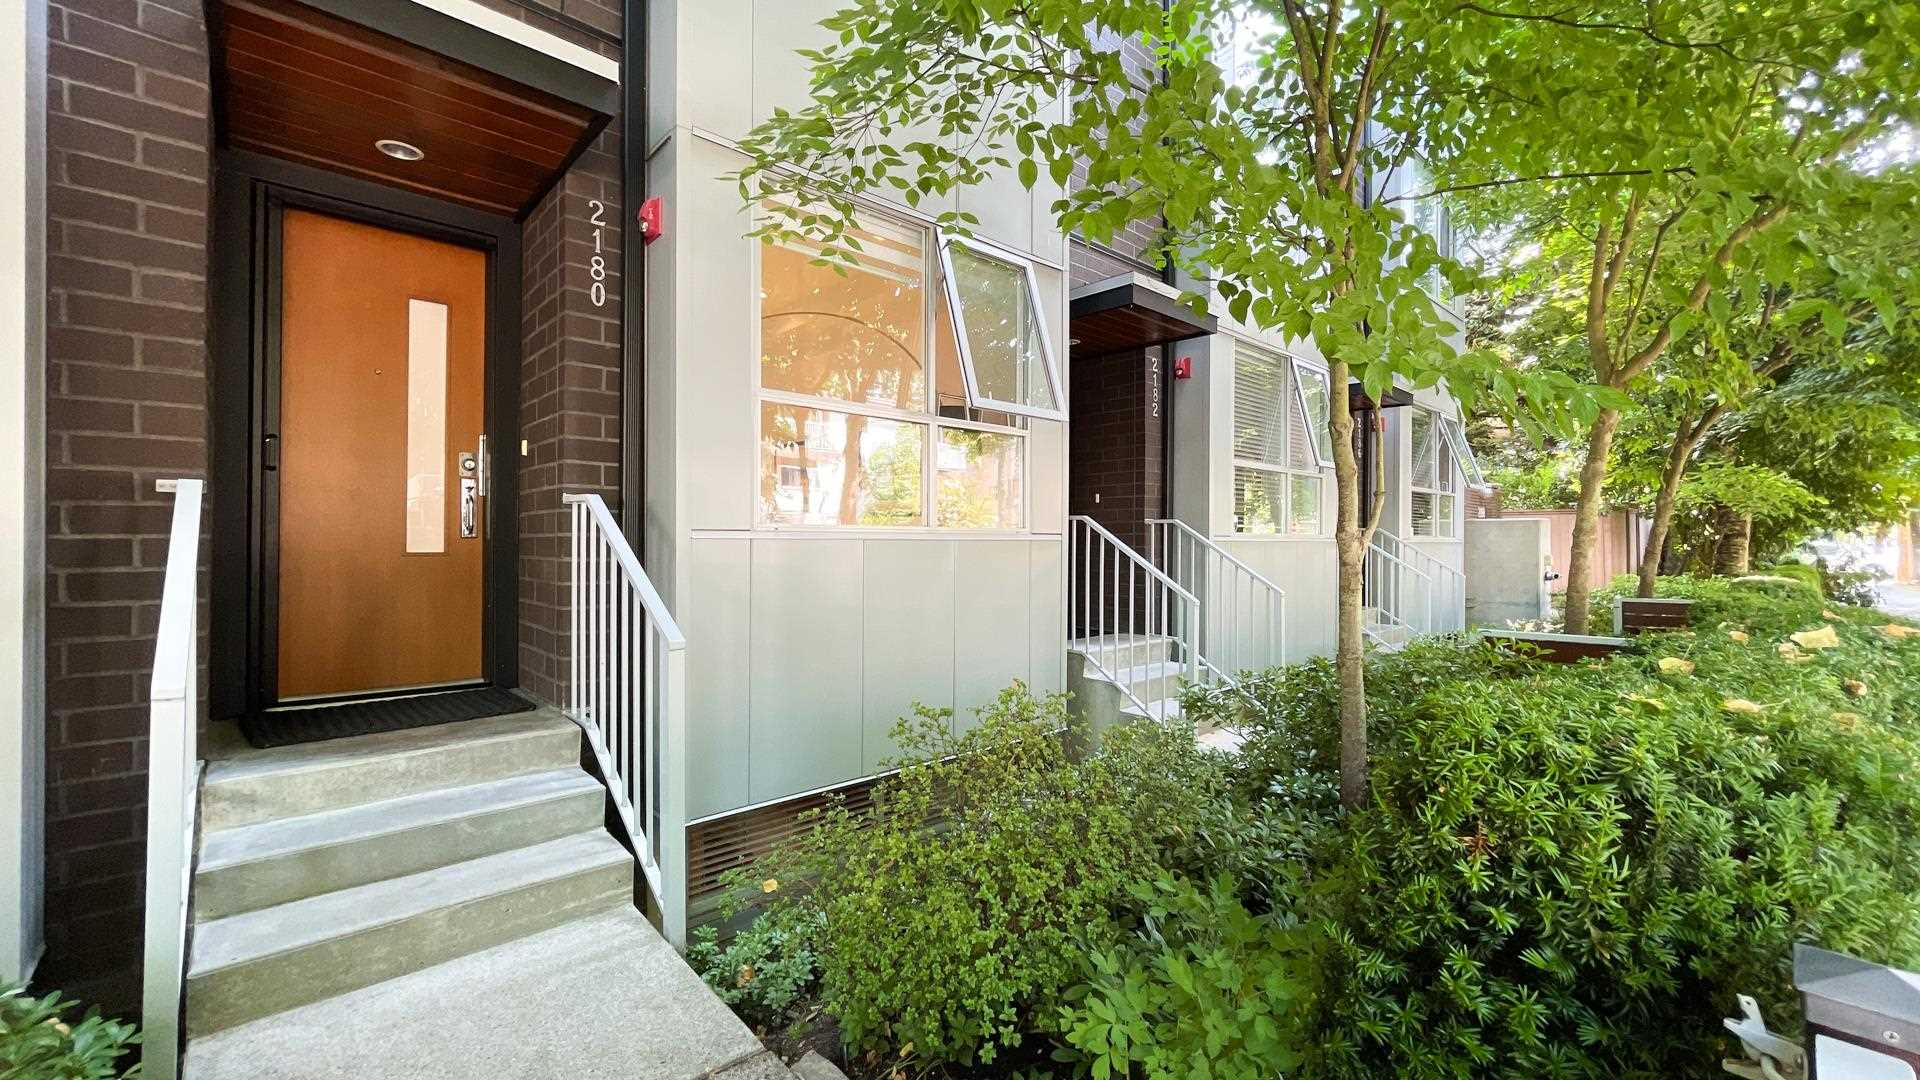 2180 W 8TH AVENUE - Kitsilano Townhouse for sale, 3 Bedrooms (R2605836)